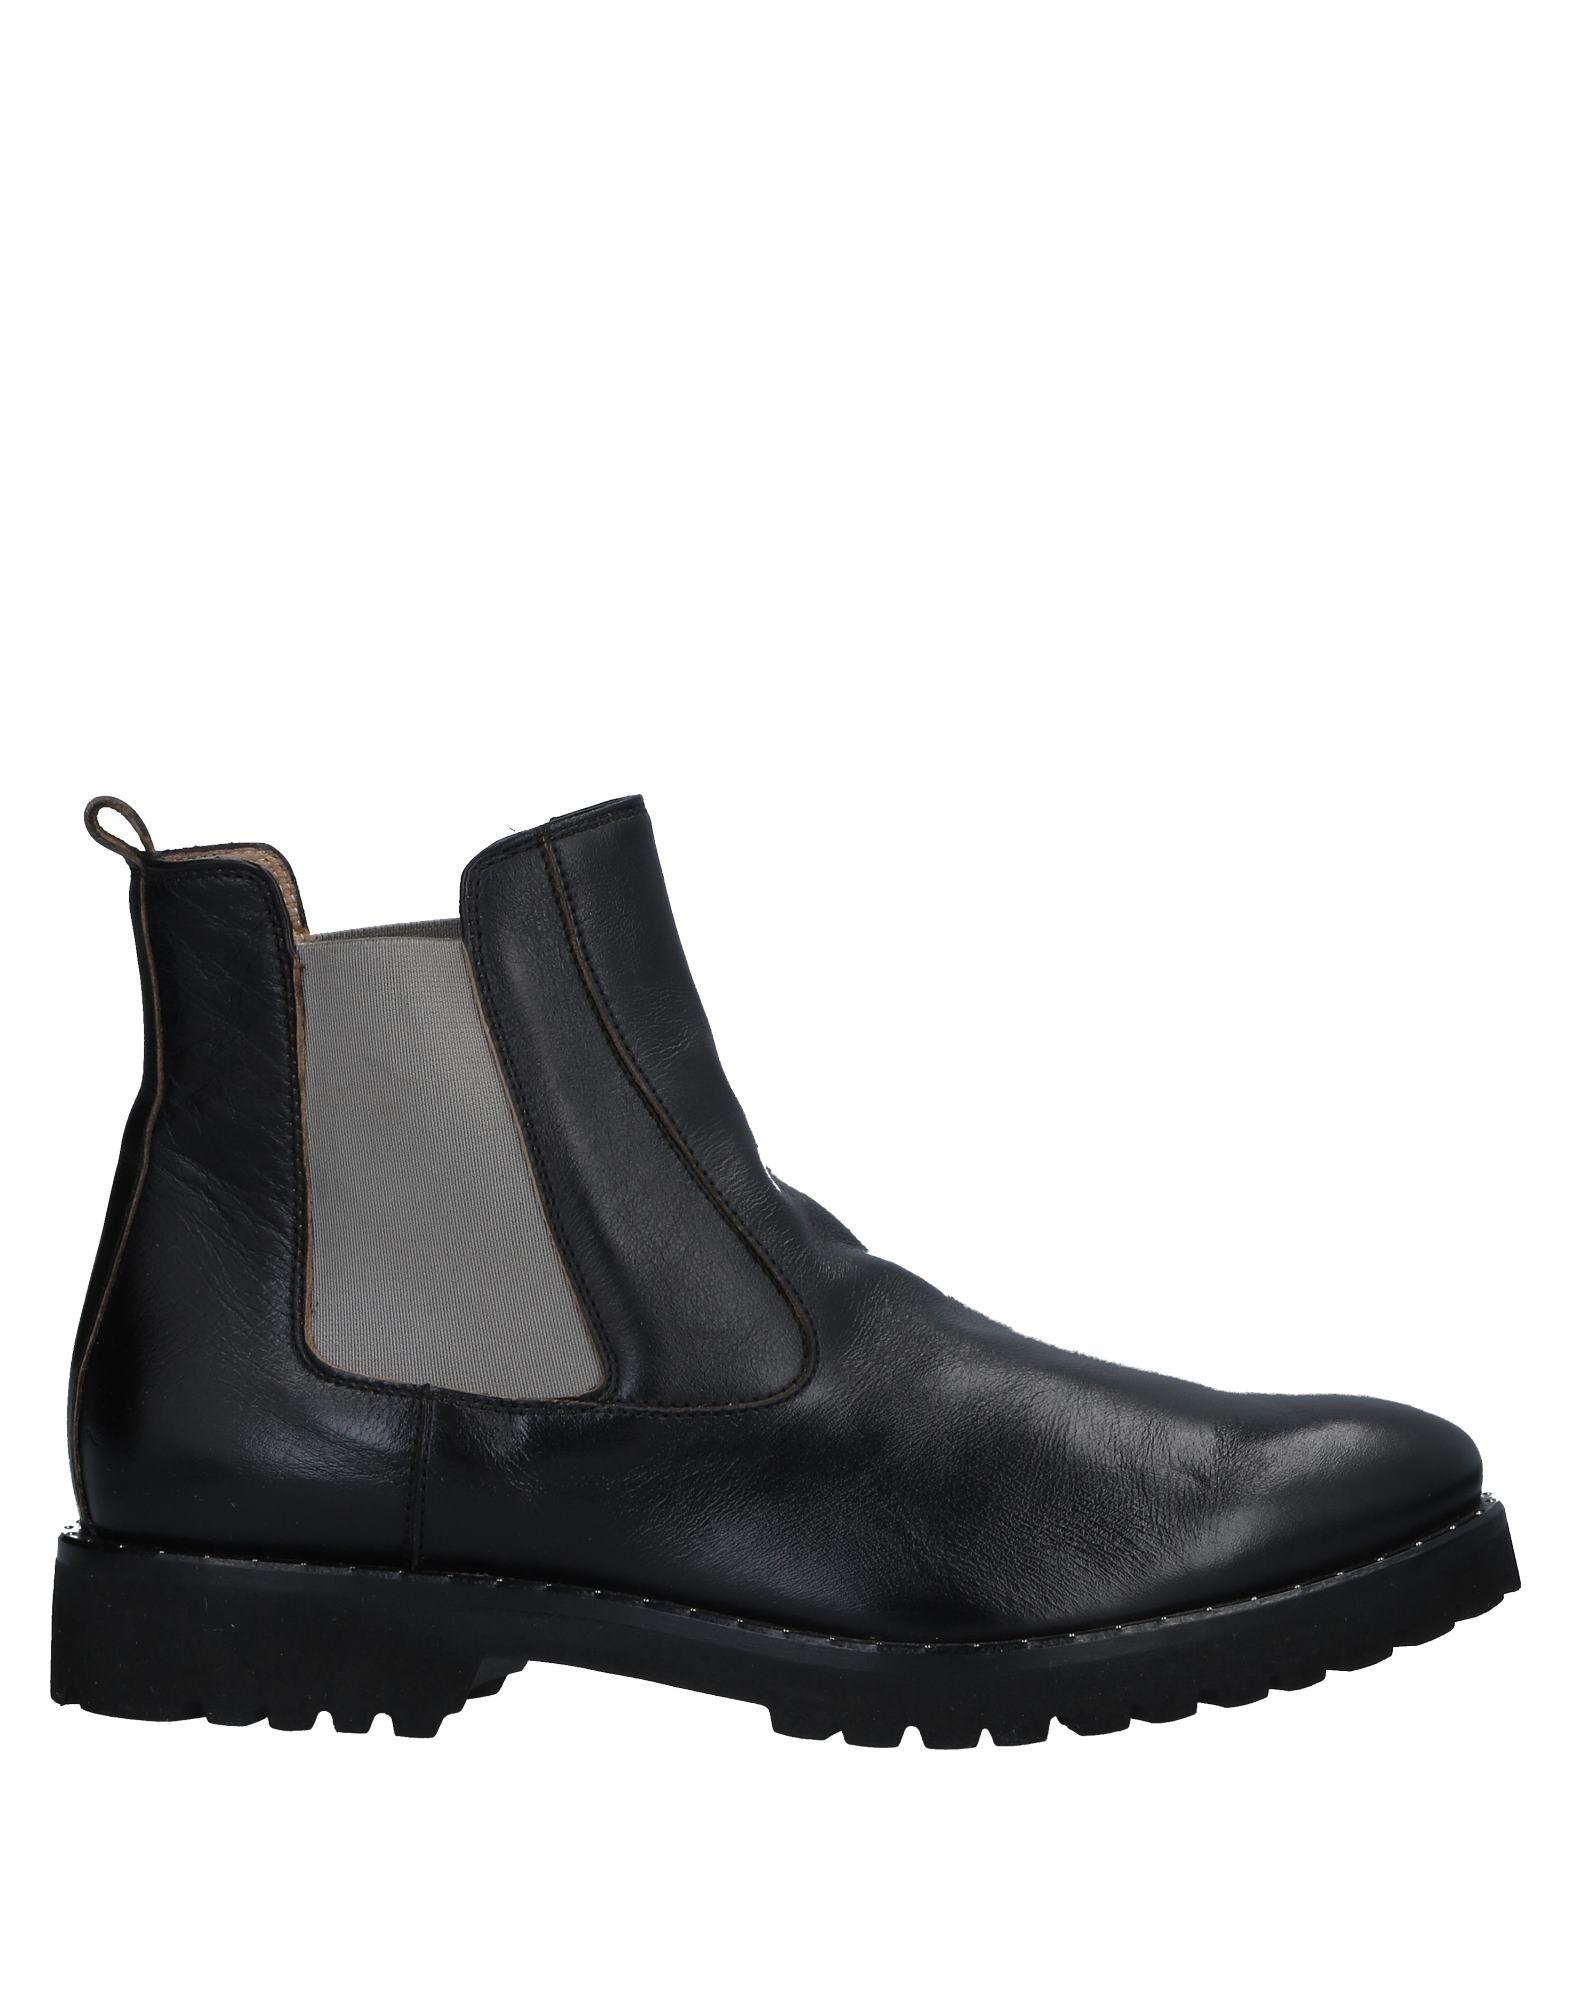 Settantatre Lr Chelsea Boots Damen  11516153RAGut aussehende strapazierfähige Schuhe